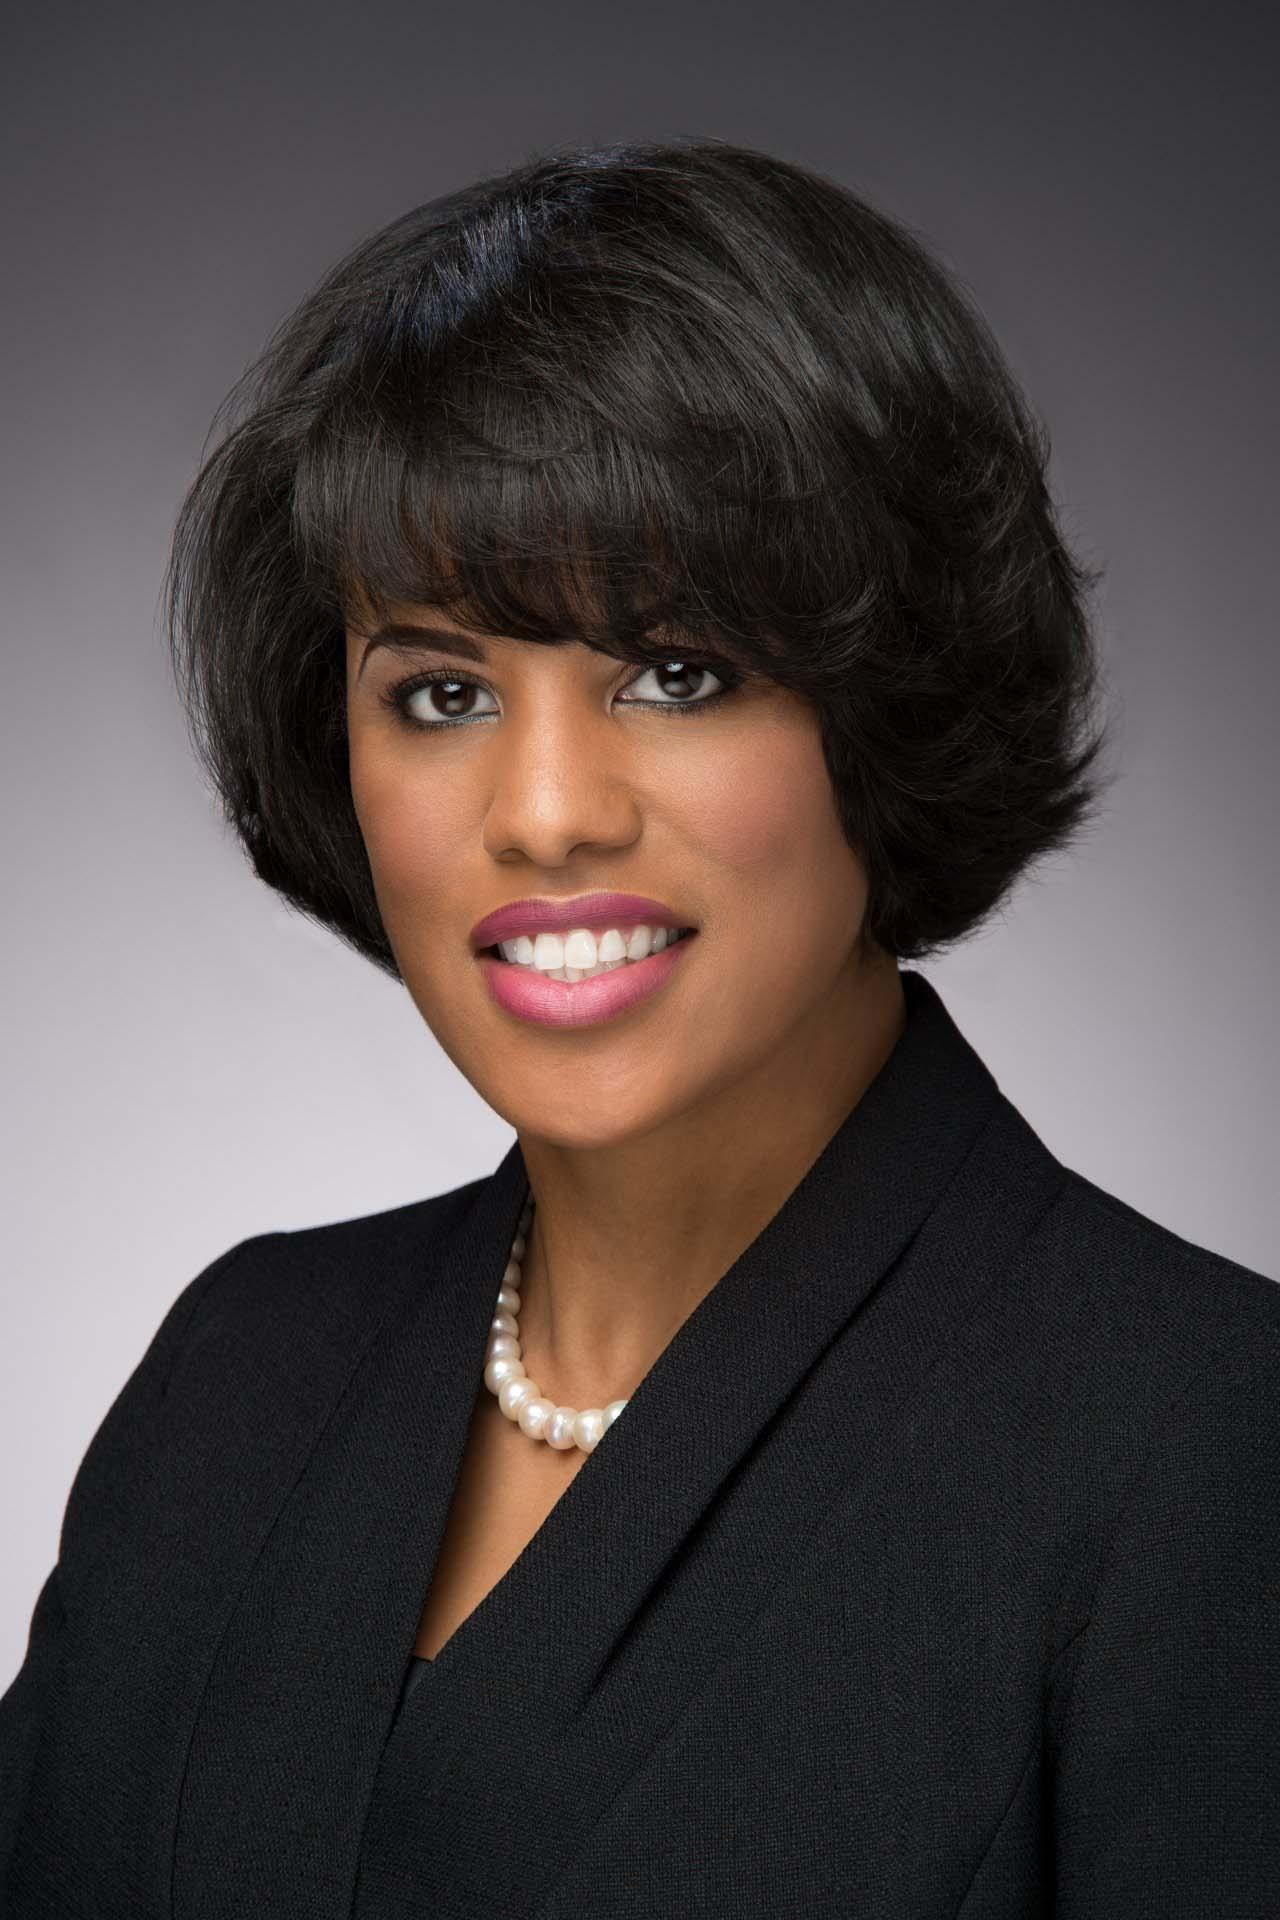 Baltimore Mayor Rawlings-Blake named President of US Conference of Mayors